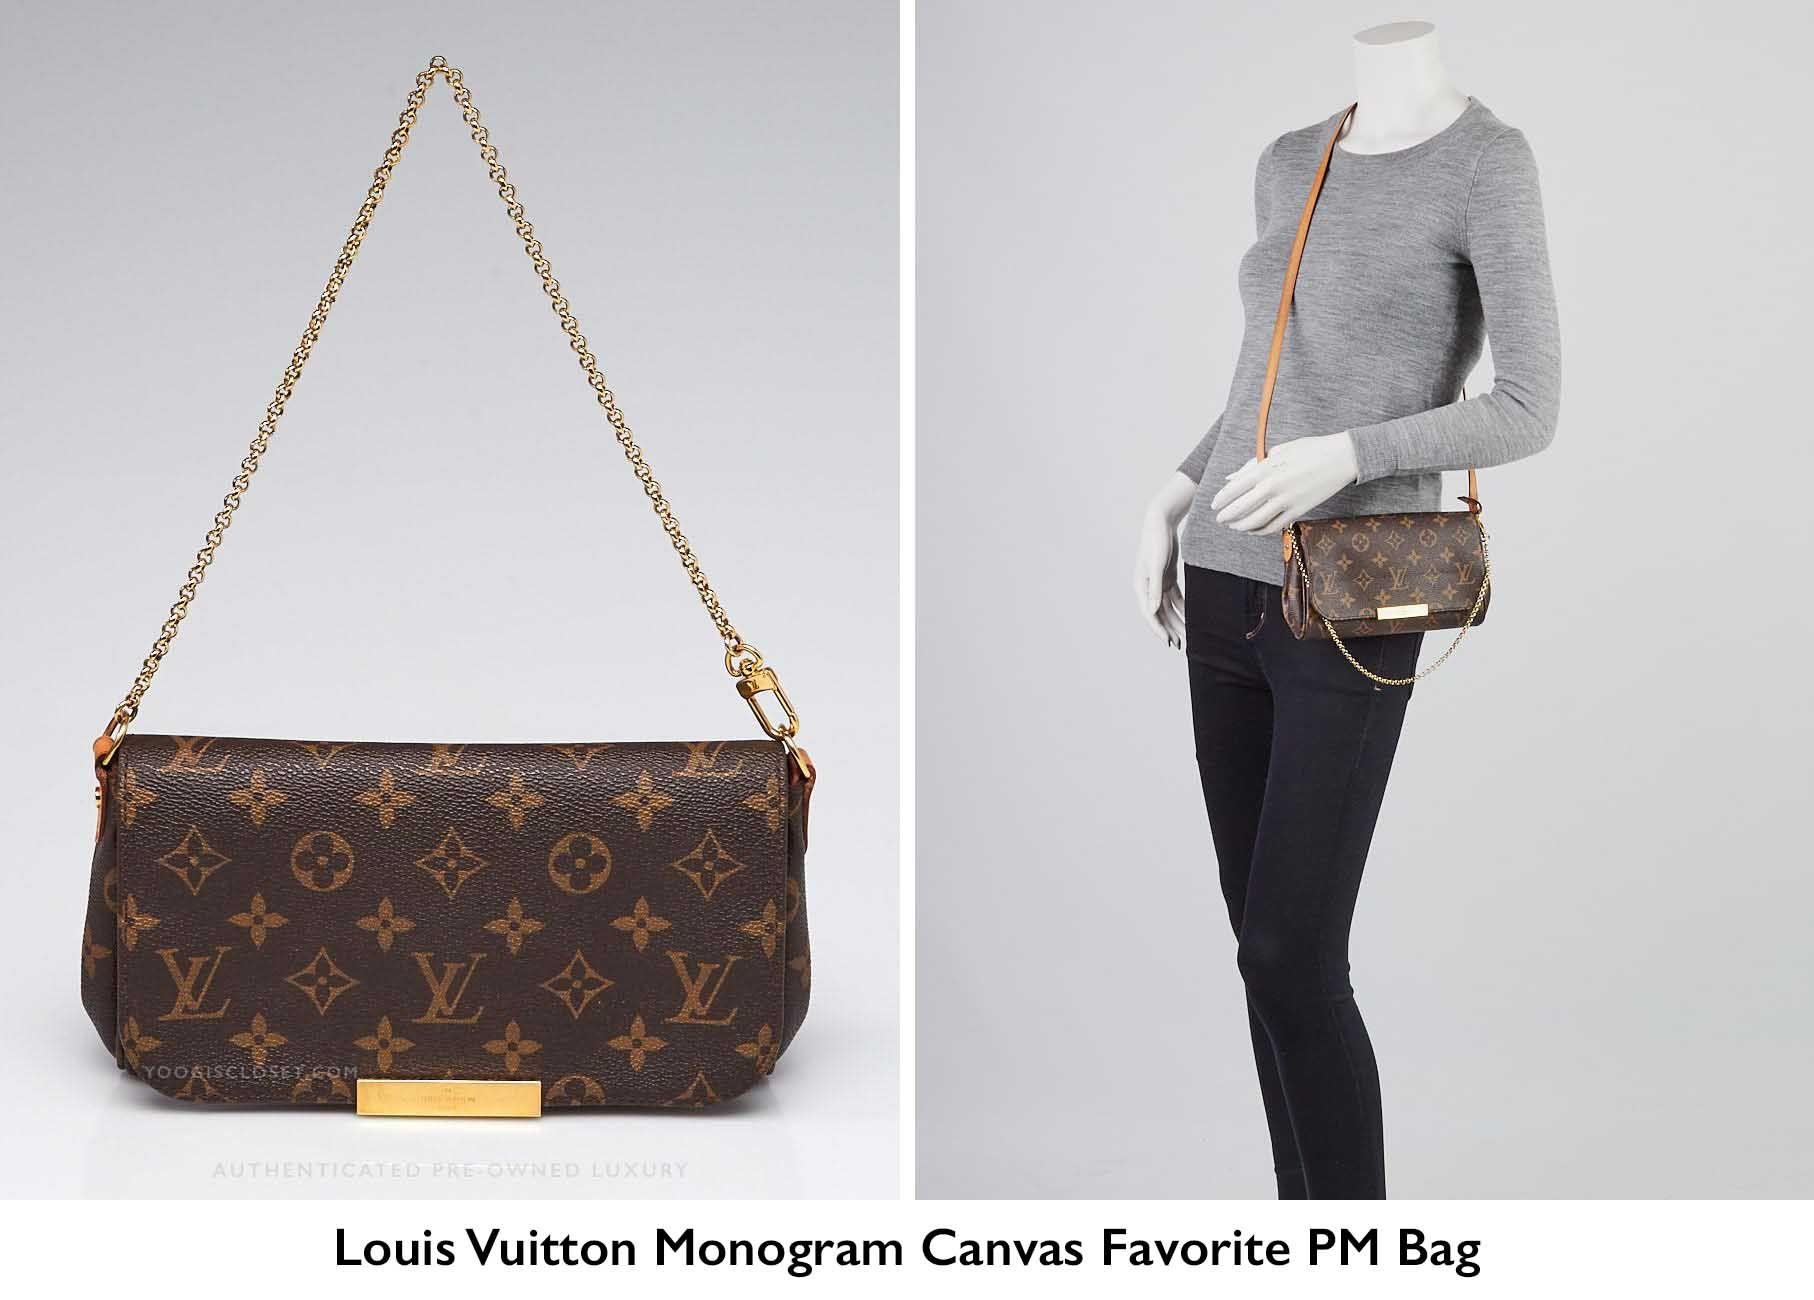 f7062f5e1a4 15 Most Popular Louis Vuitton Monogram Small Crossbody Bags ...